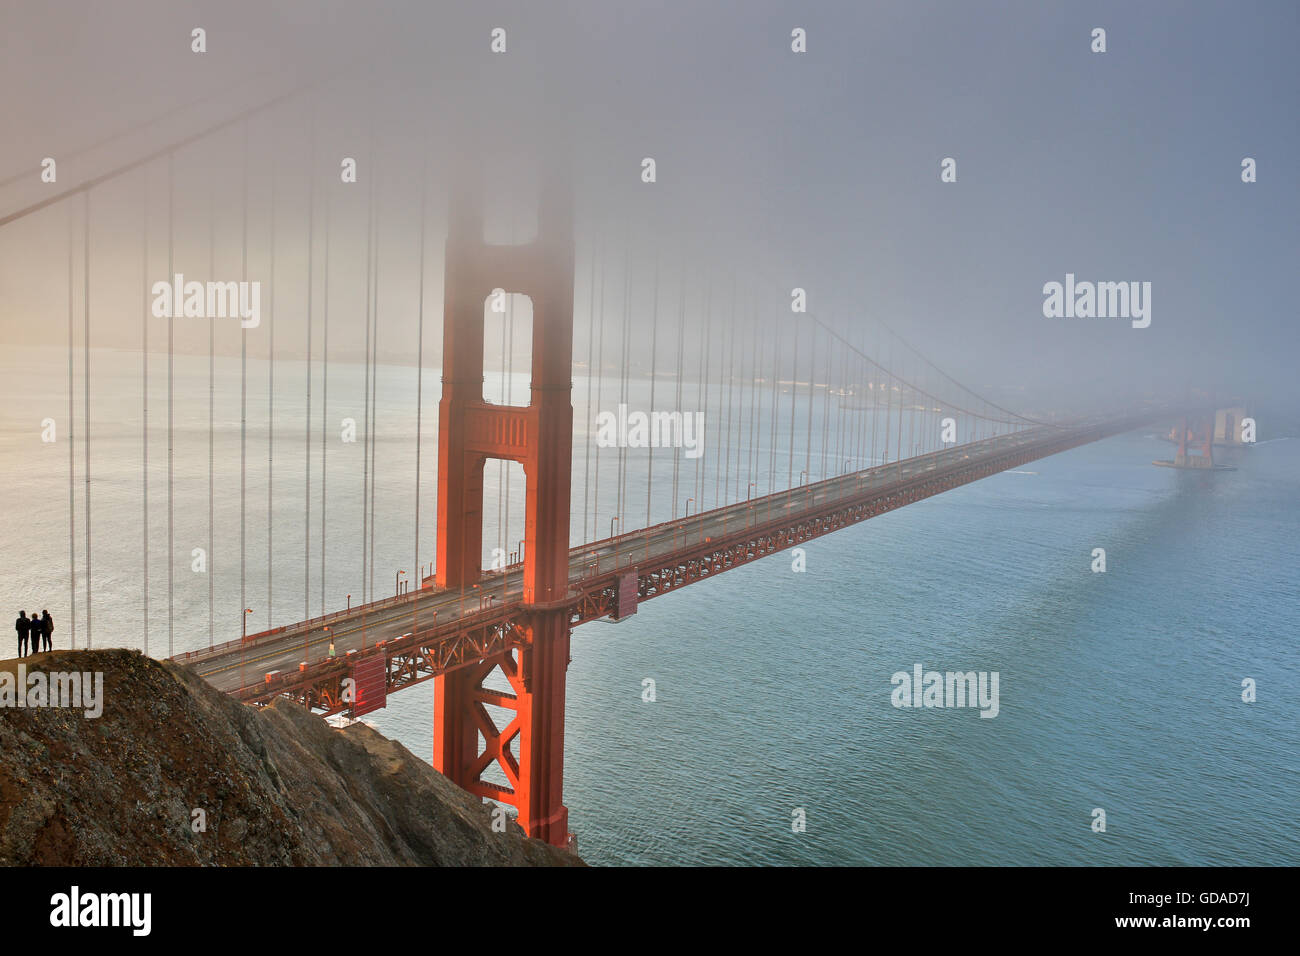 Brume, brouillard, et des silhouettes. Le Golden Gate Bridge, San Francisco, California, USA Photo Stock